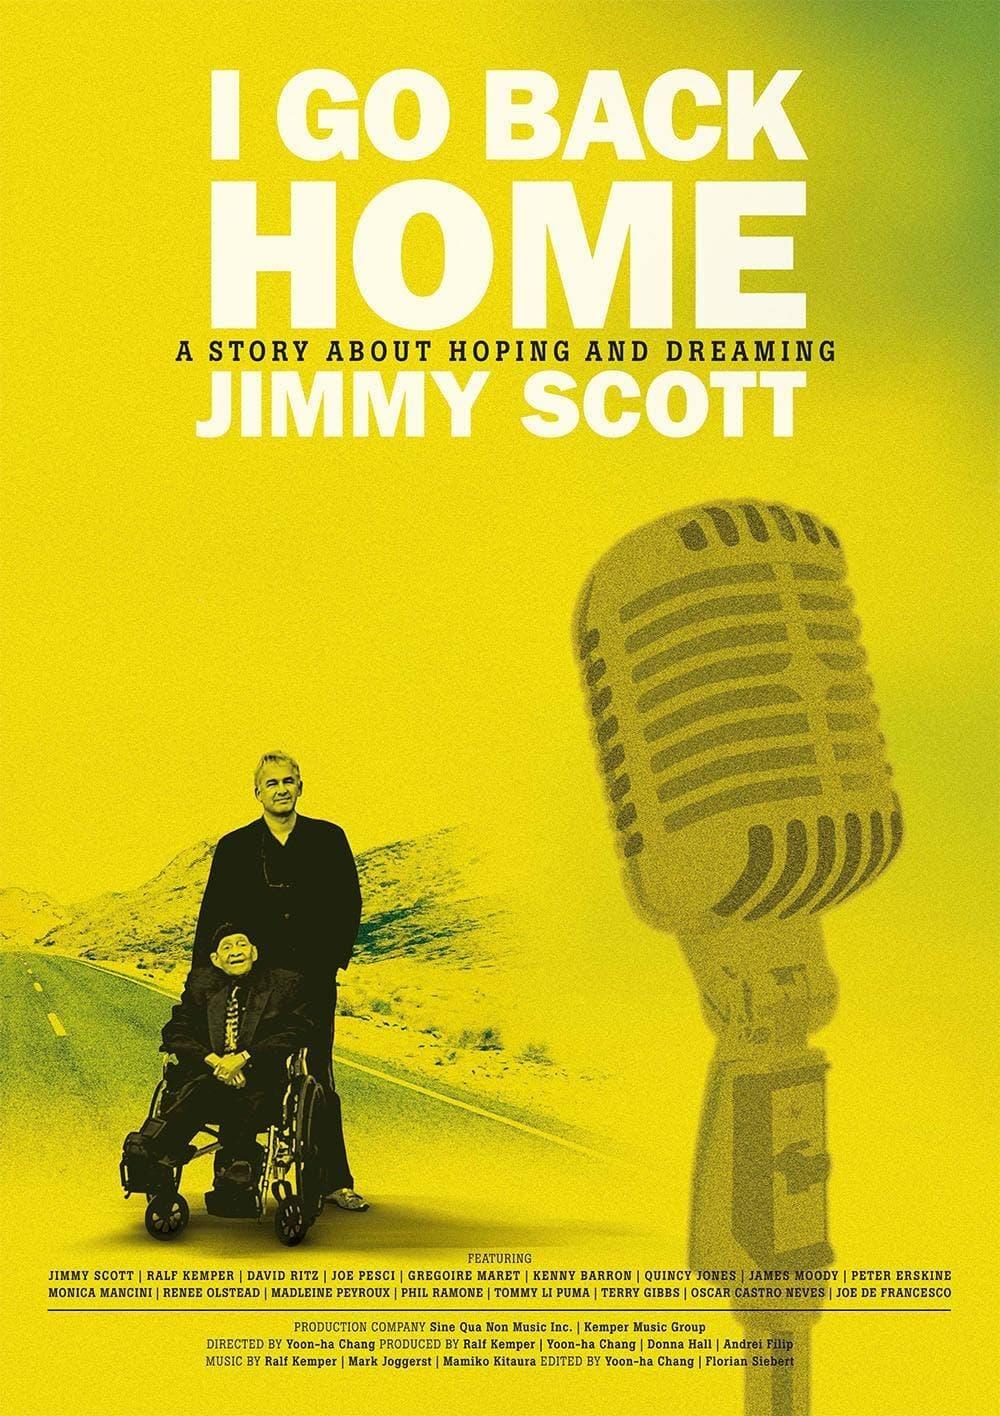 I Go Back Home - Jimmy Scott